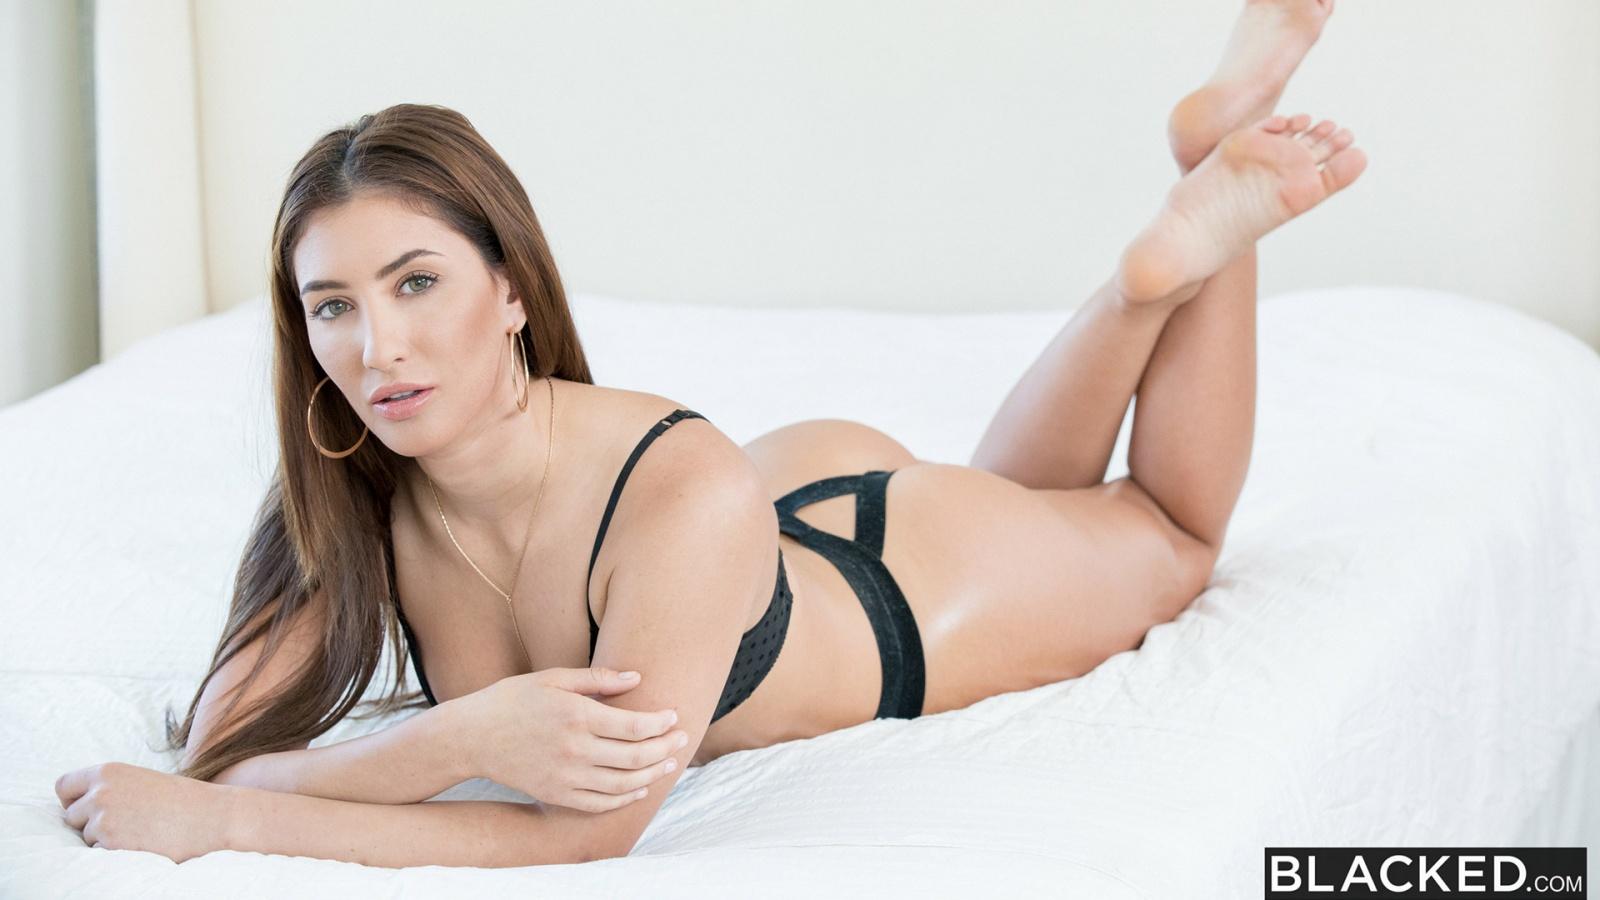 what phrase..., brilliant marilyn milian bikini there can not mistake?